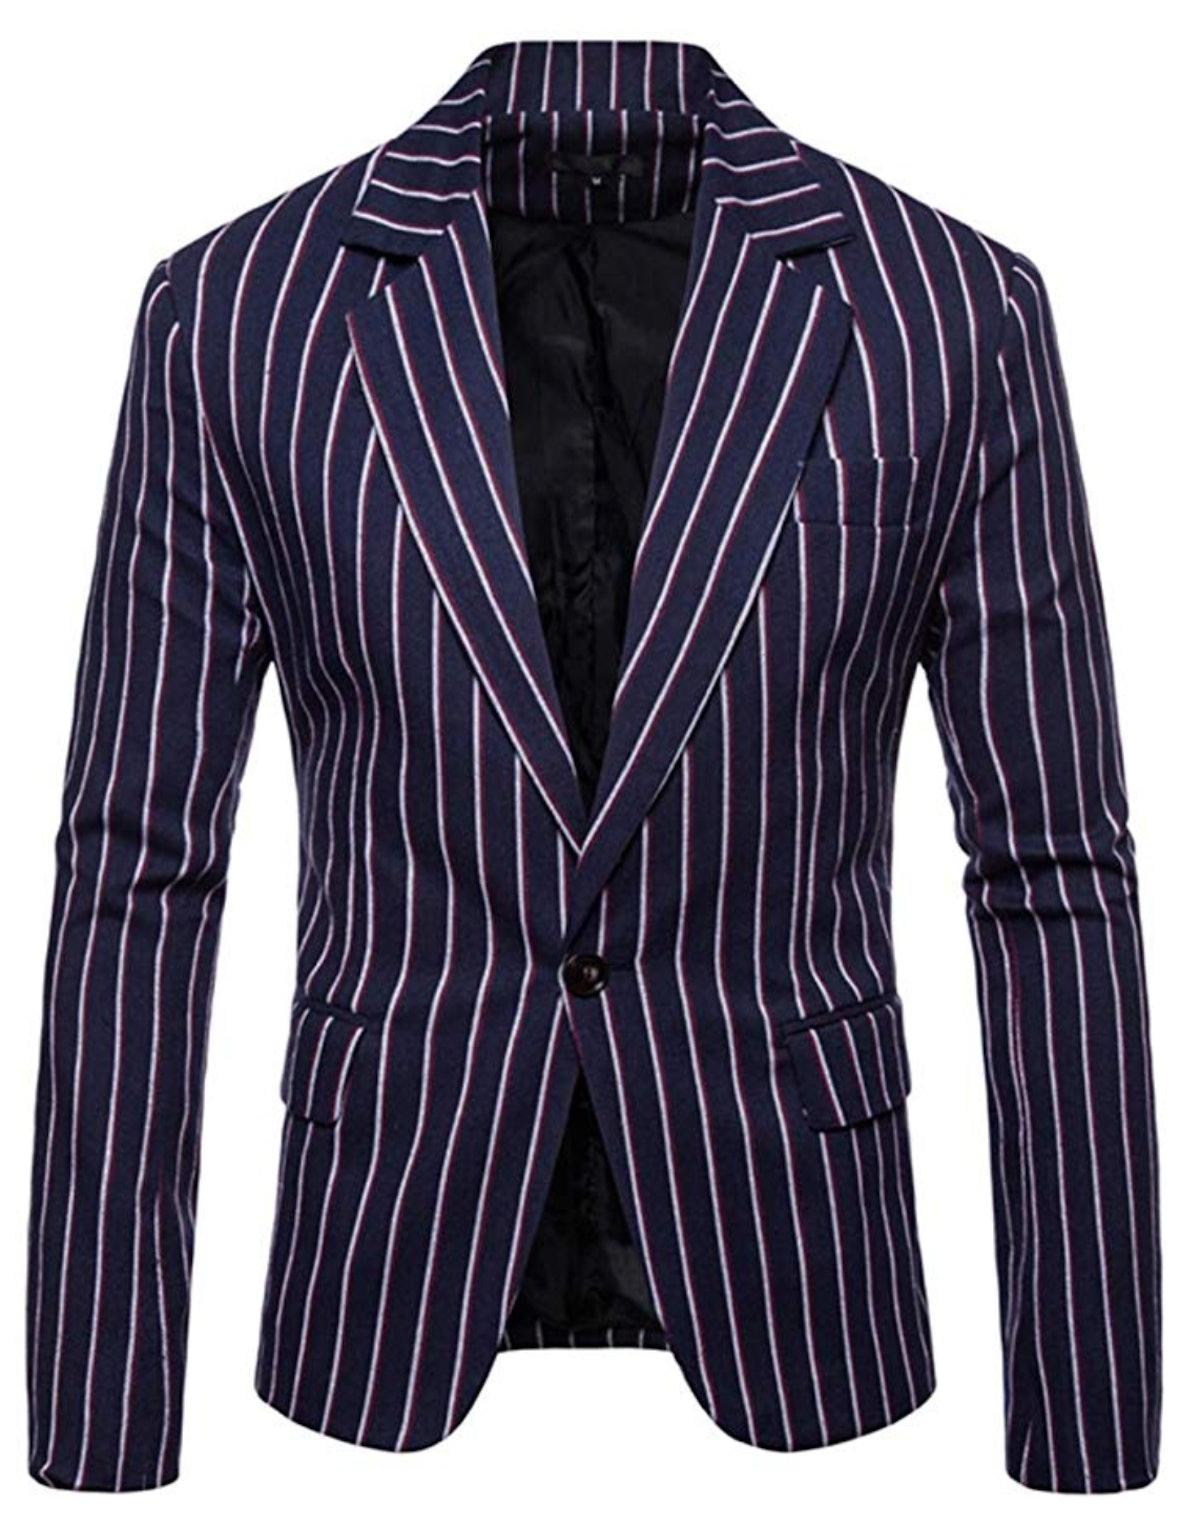 Iynnijoy Men's Casual Pinstripe Sport Coat